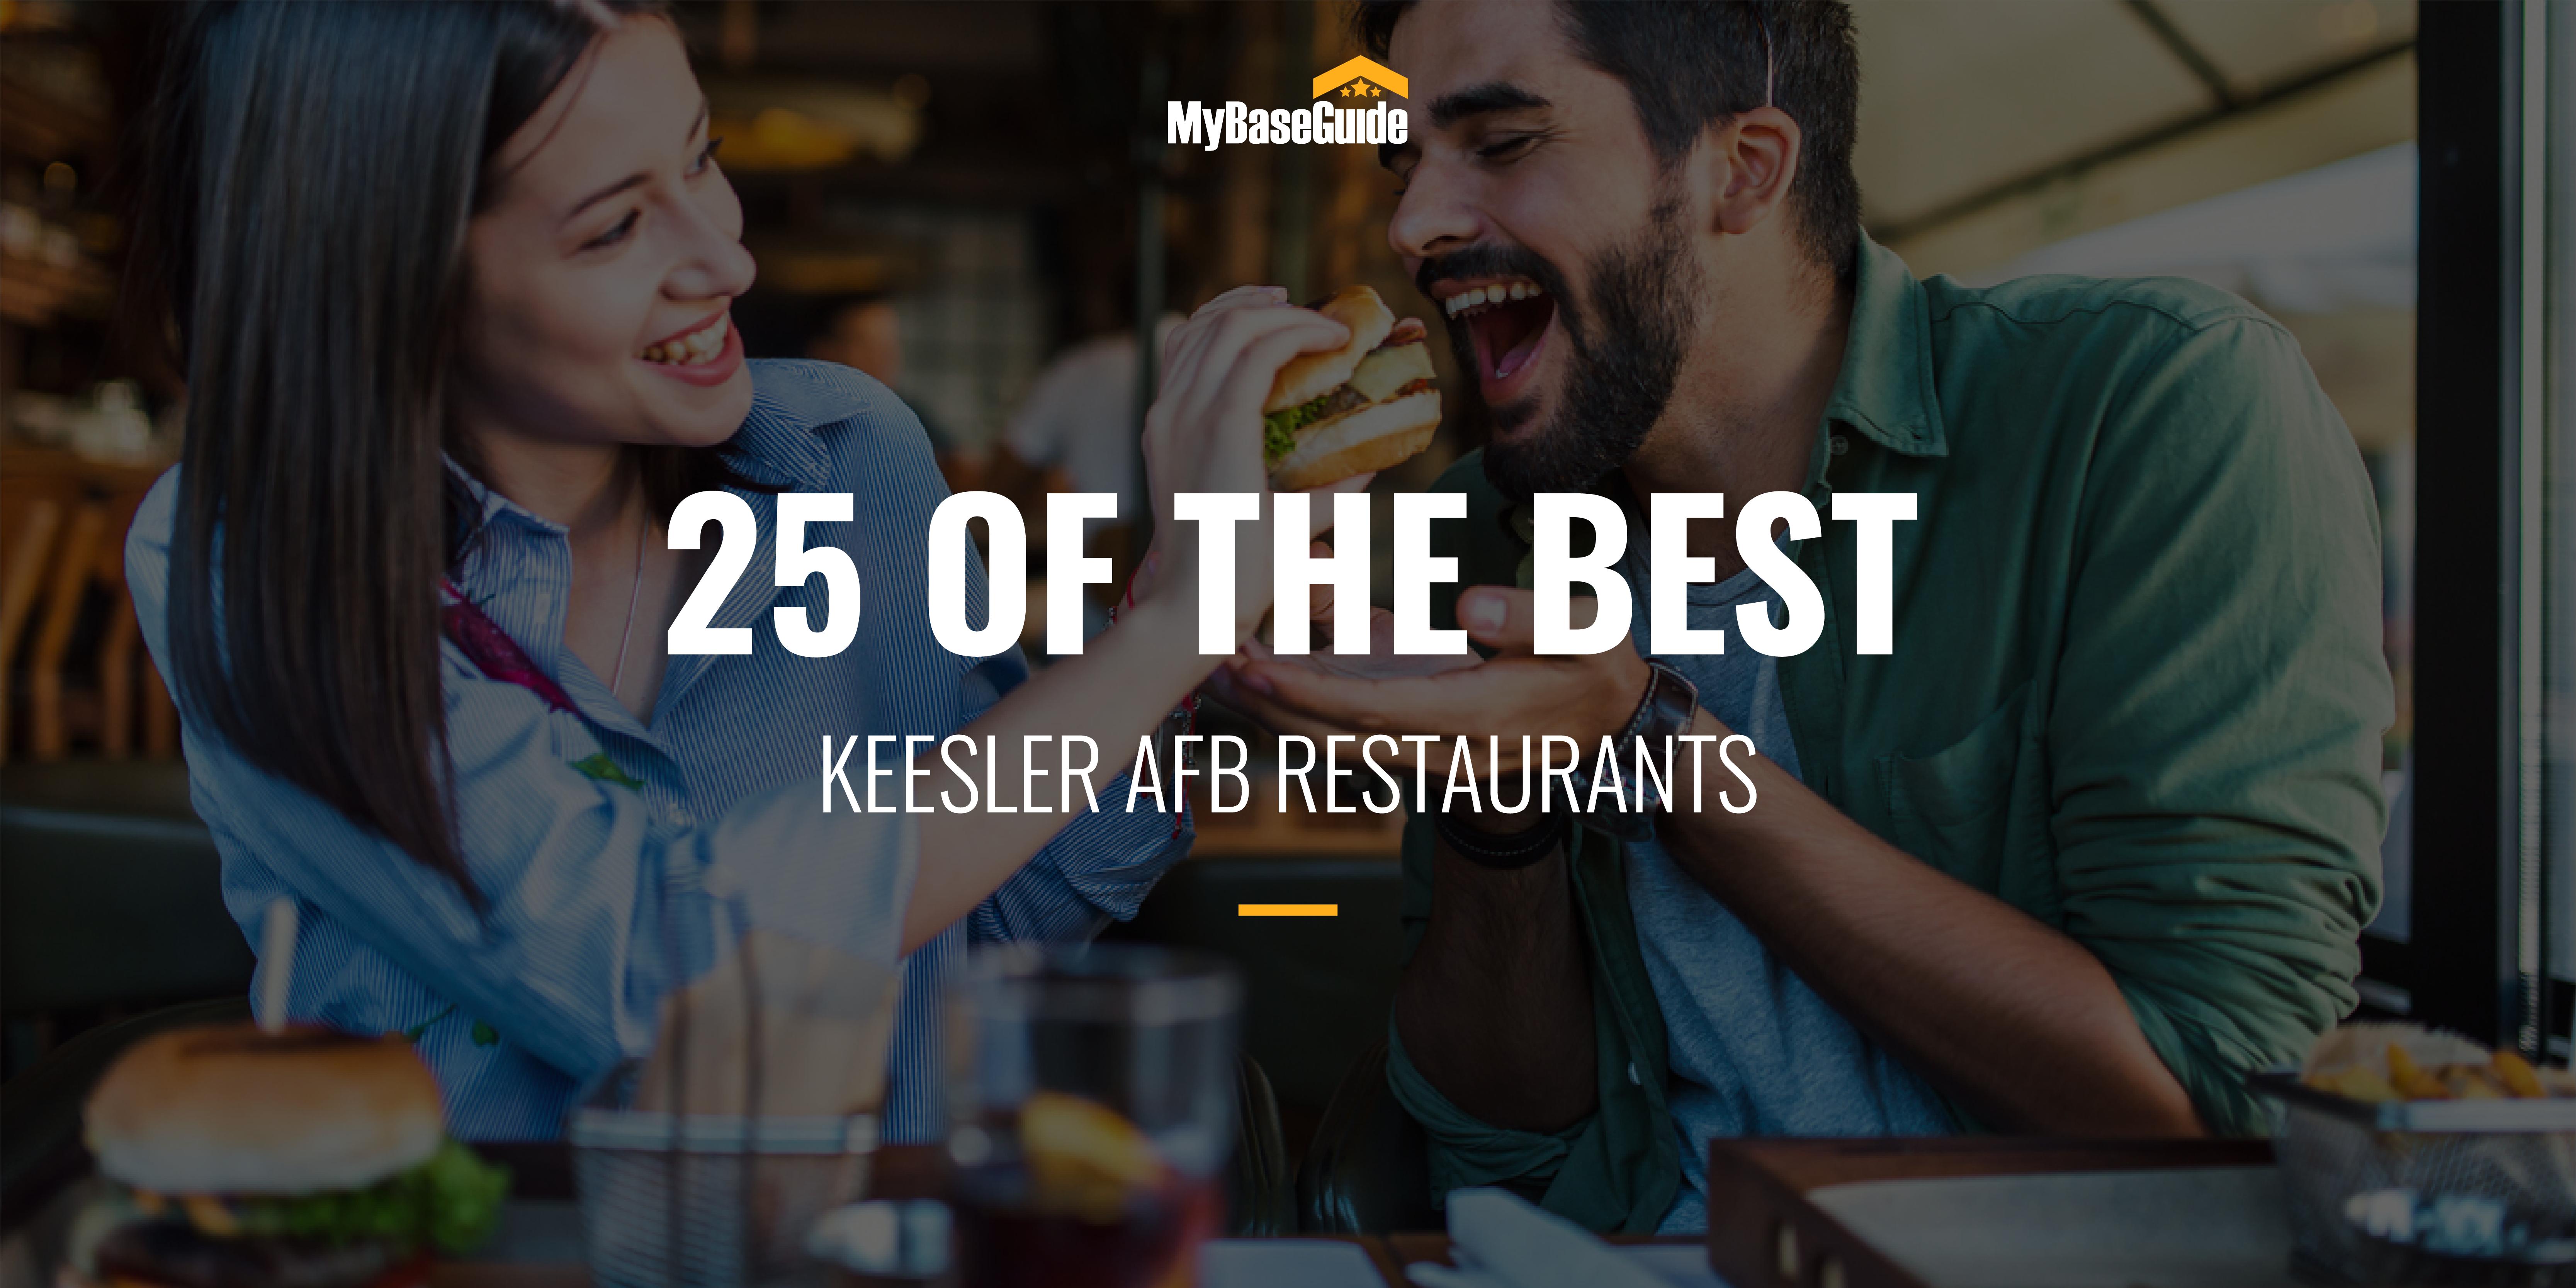 25 of the Best Keesler AFB Restaurants